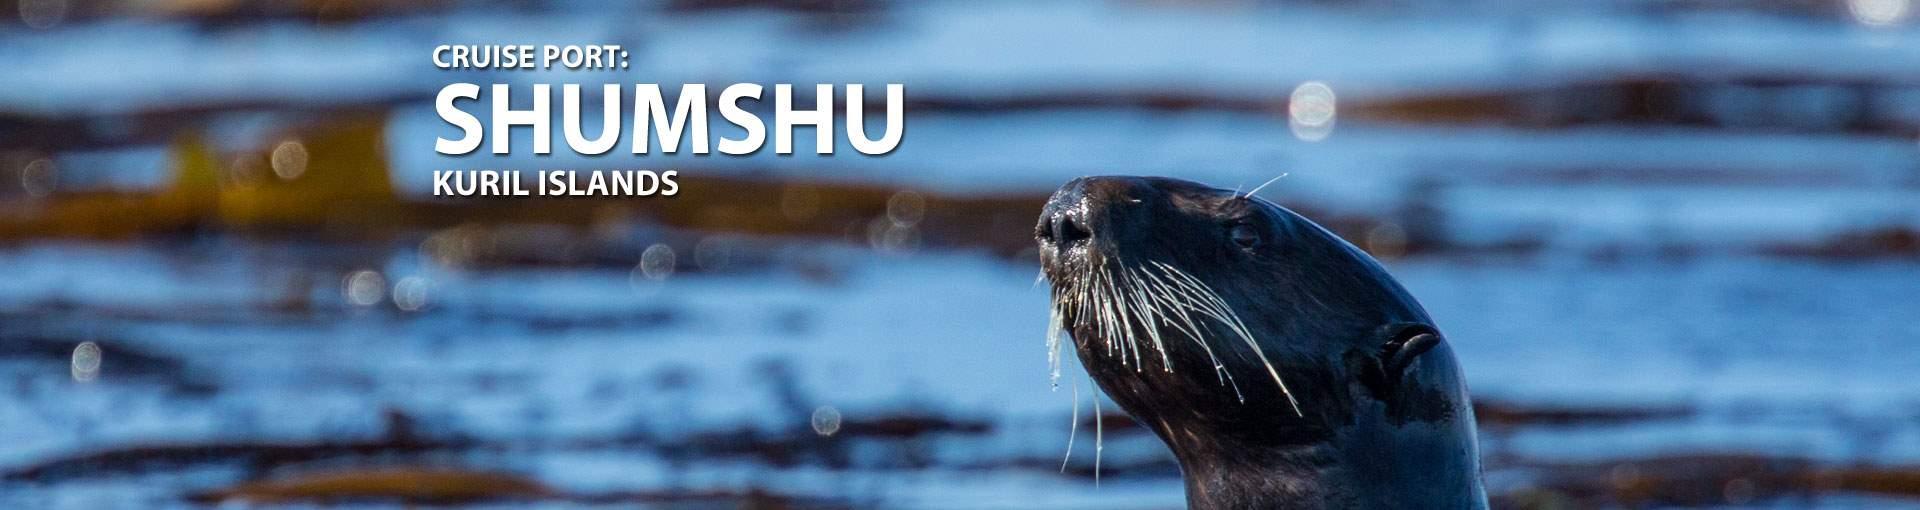 Cruises to Shumshu, Kuril Islands